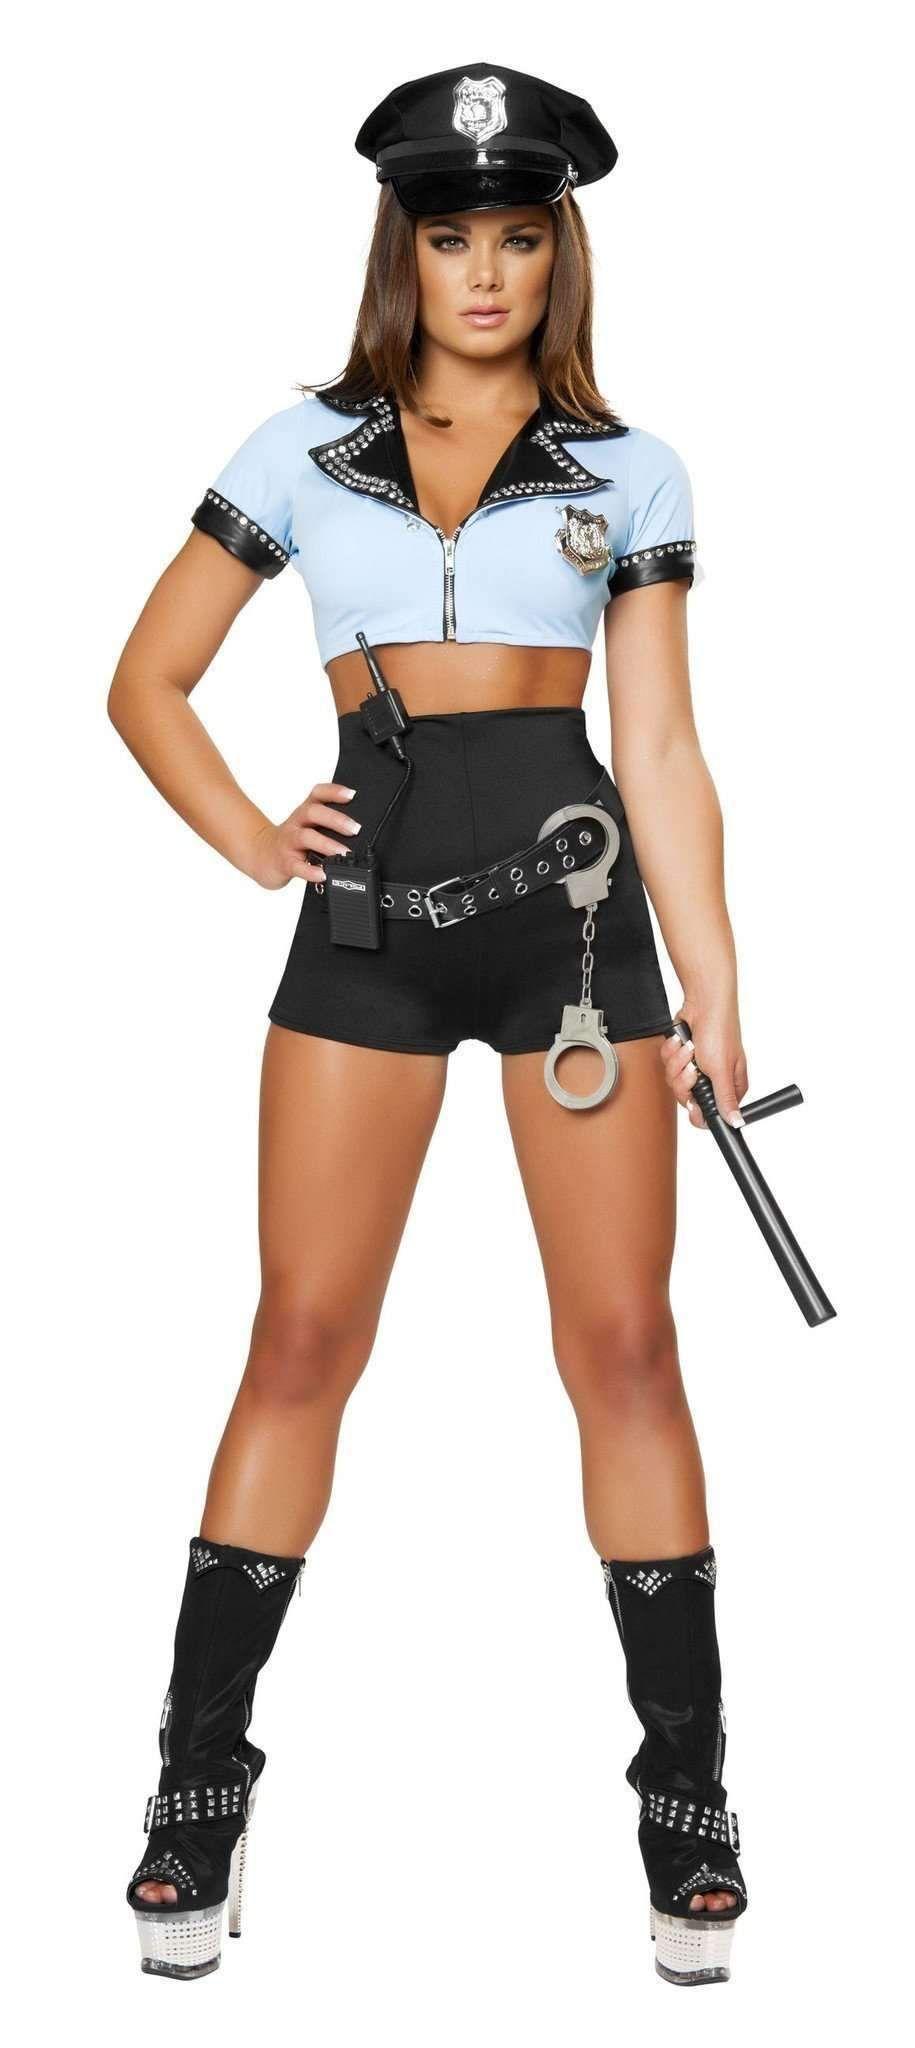 52604a8fce4c5 Roma Costume 4398-8Pc Sexy Police Woman | Costume | Sexy cop costume ...